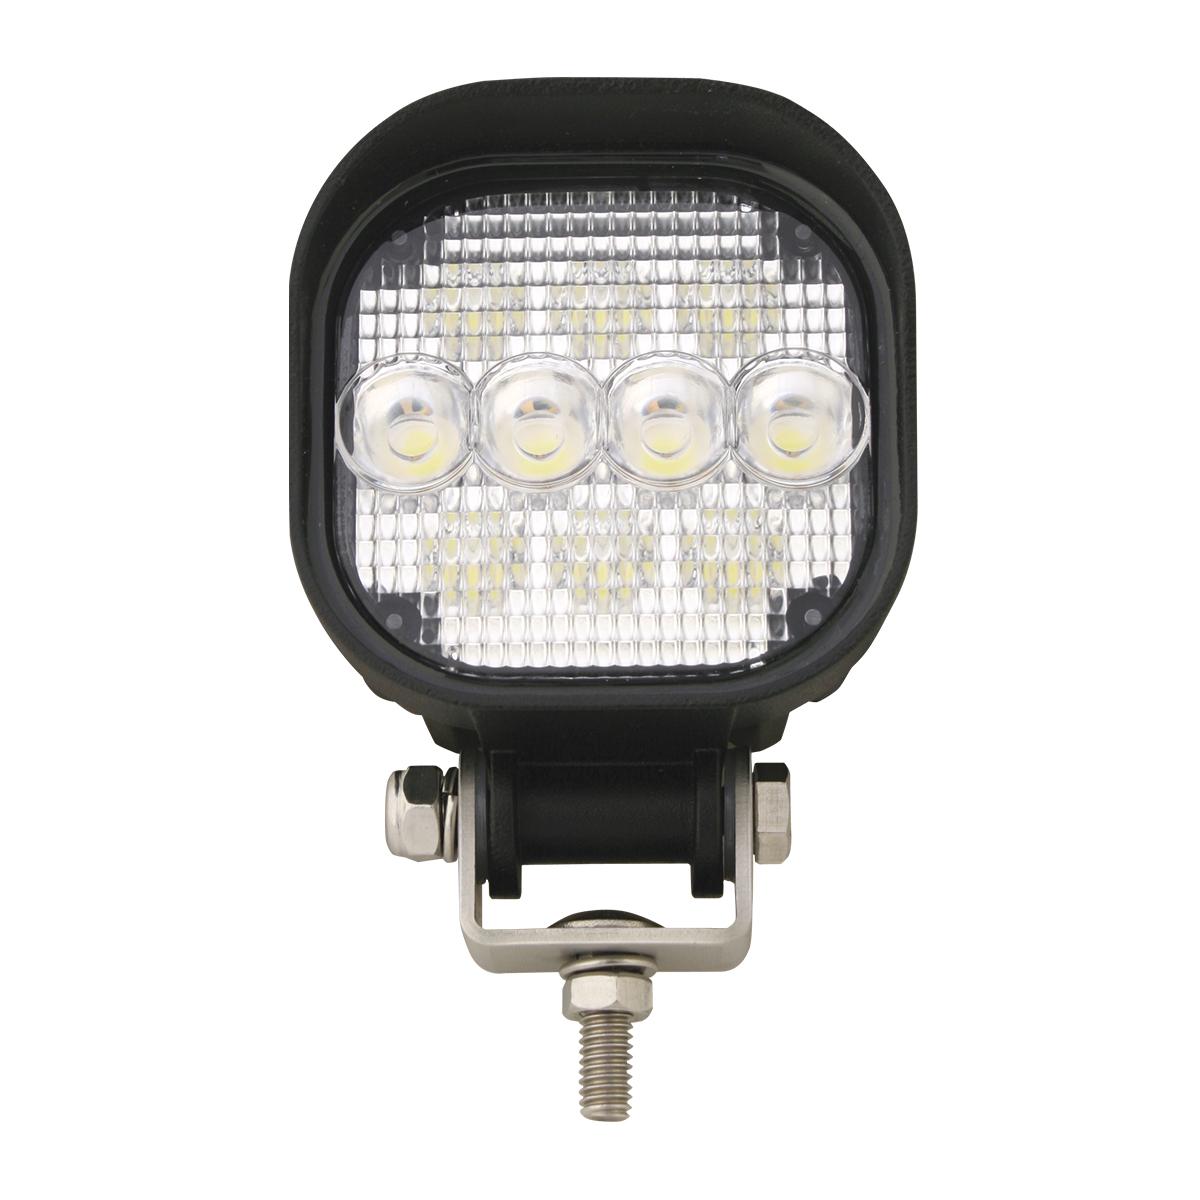 76352 Small High Power LED Work Light